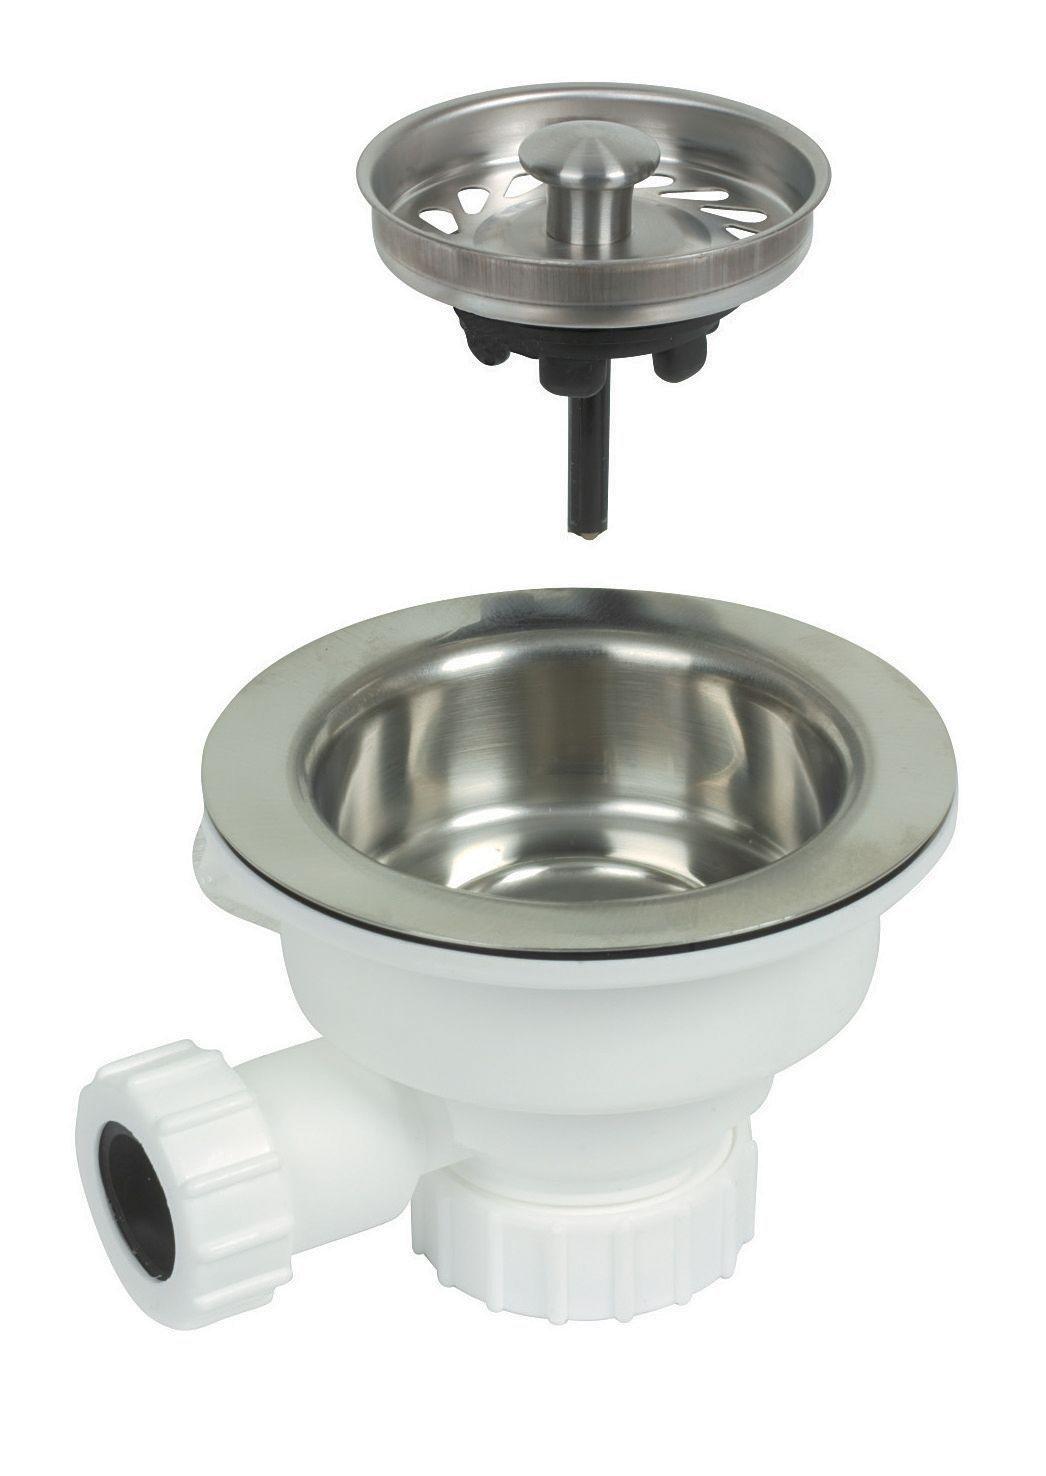 opella kitchen sink waste kit dia 40mm